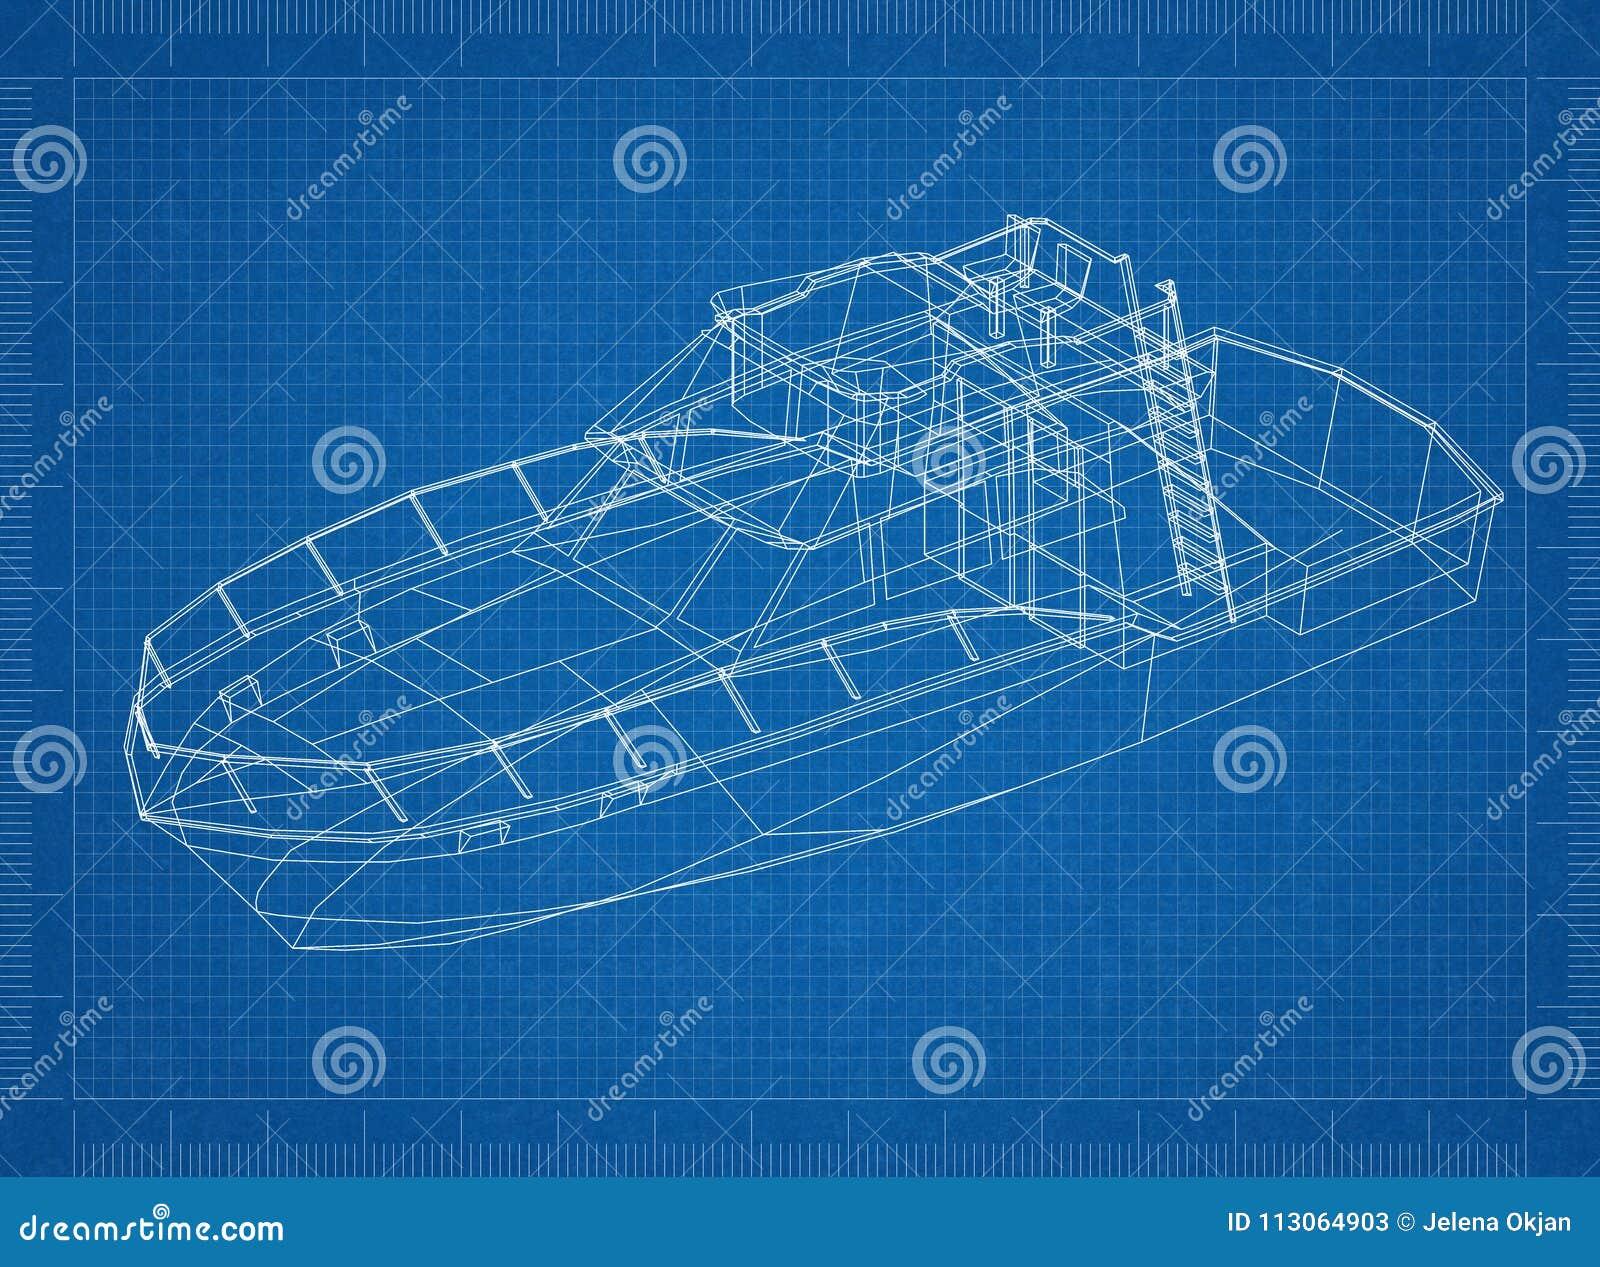 Yacht 3D blueprint